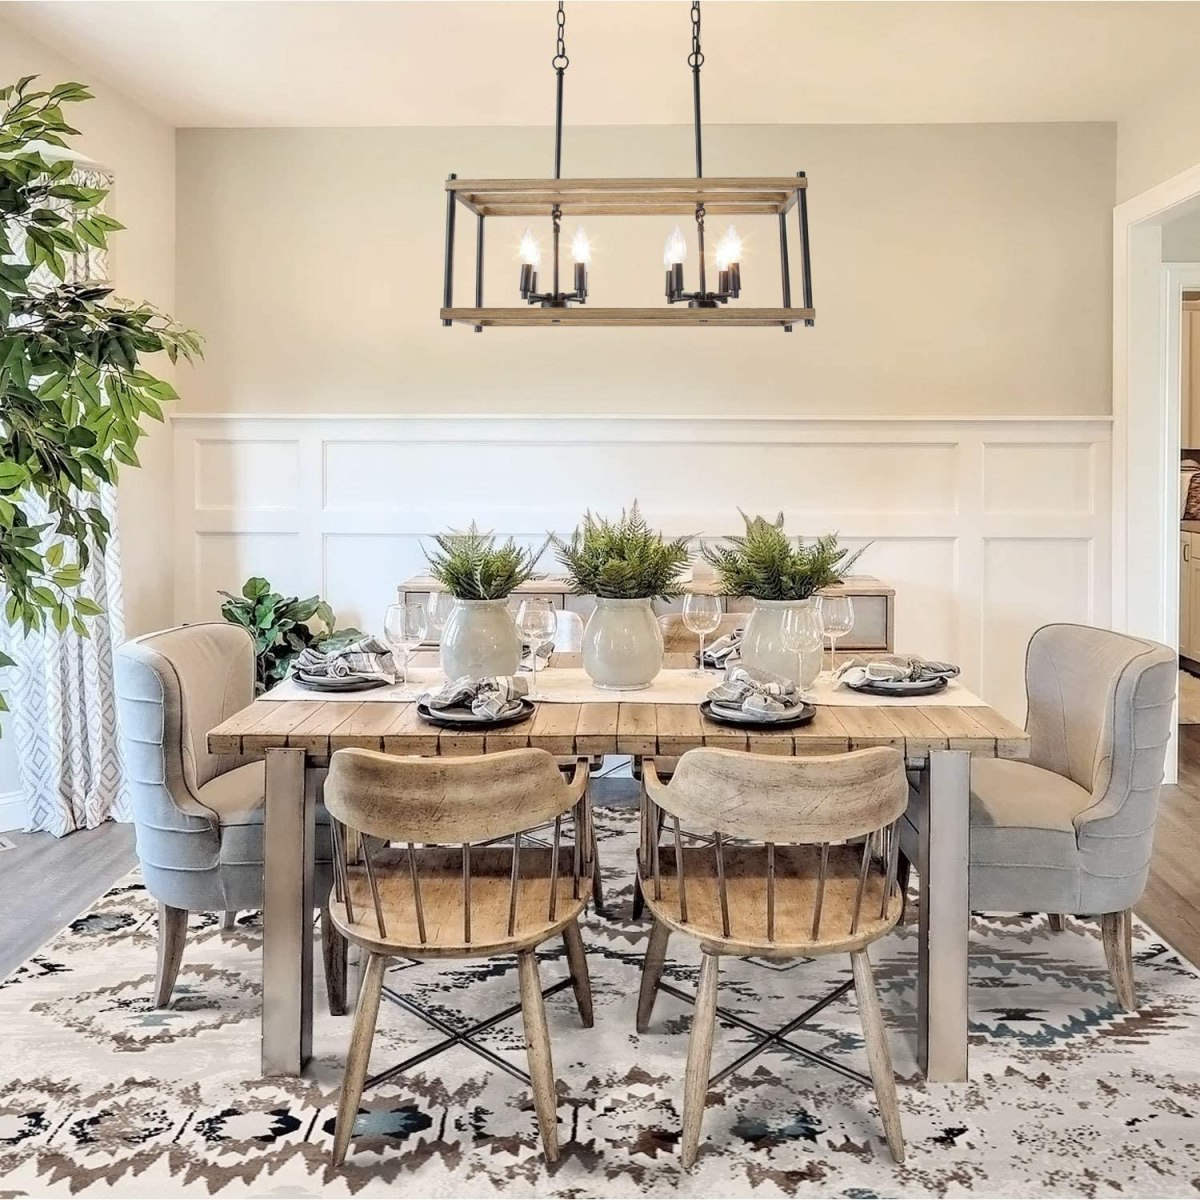 Kitchen-Island-Dining-Light-Fixture